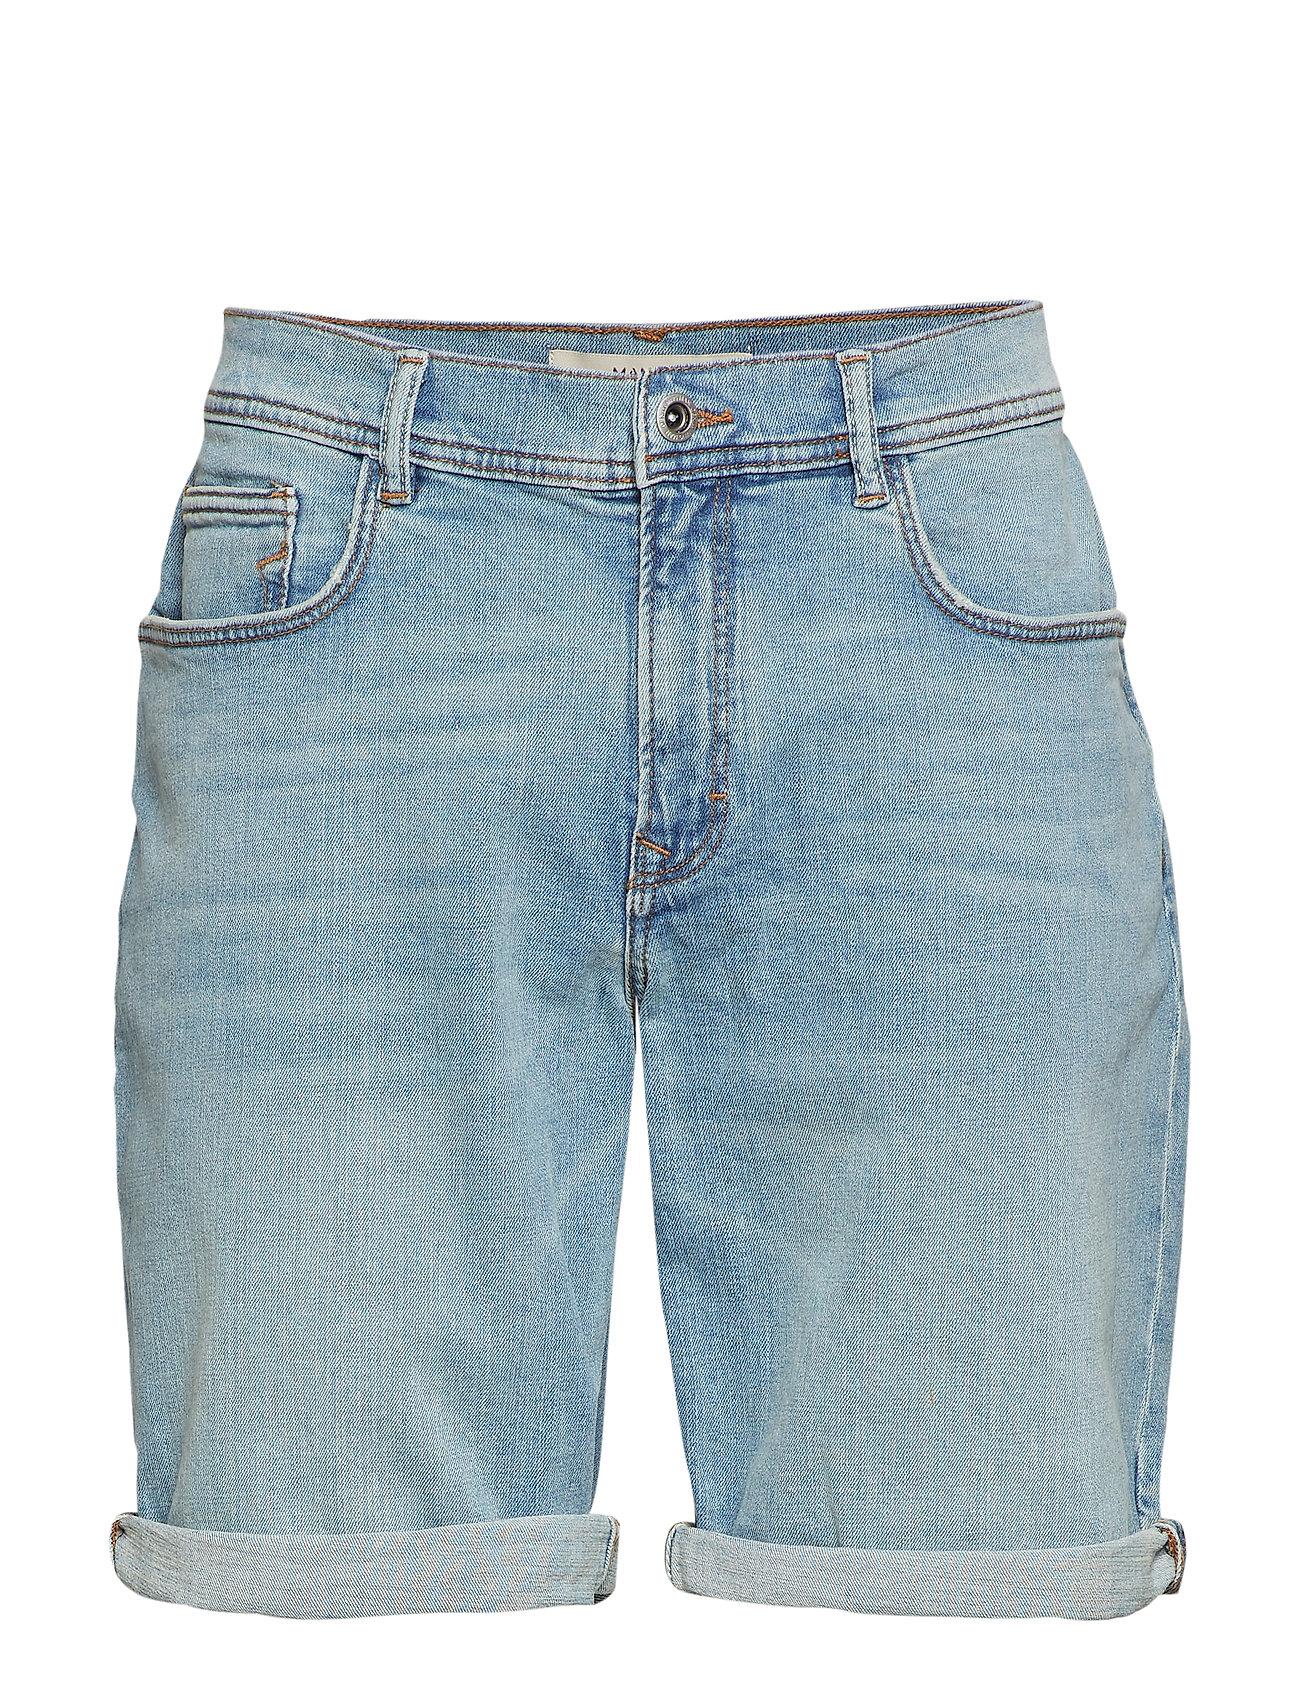 Mango Man Light wash denim bermuda shorts Shorts